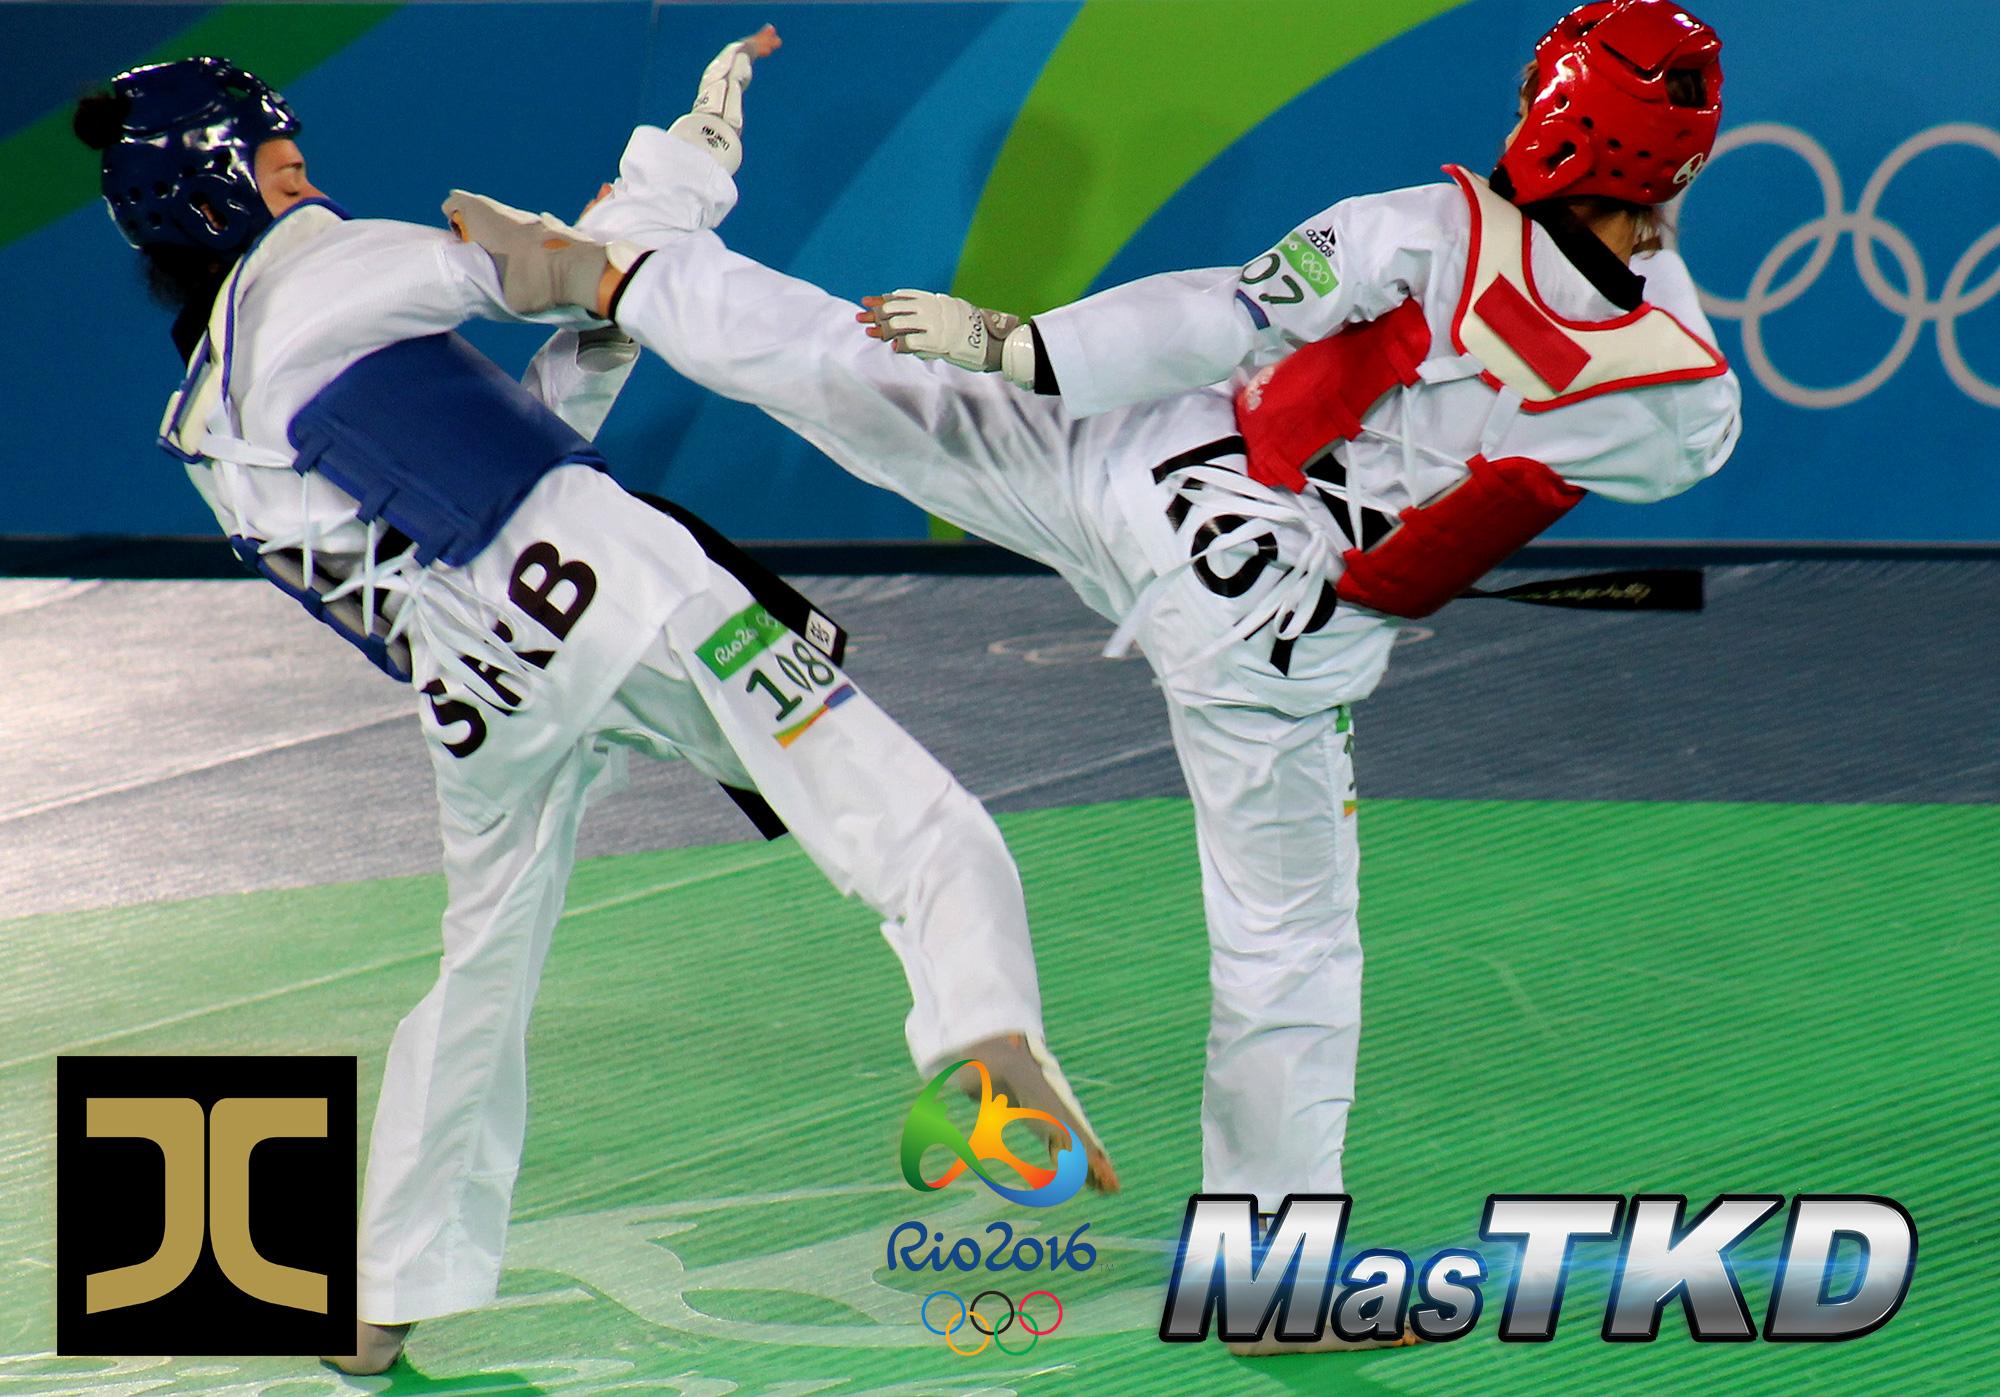 20160817_Taekwondo_JC_masTKD_Rio2016_04